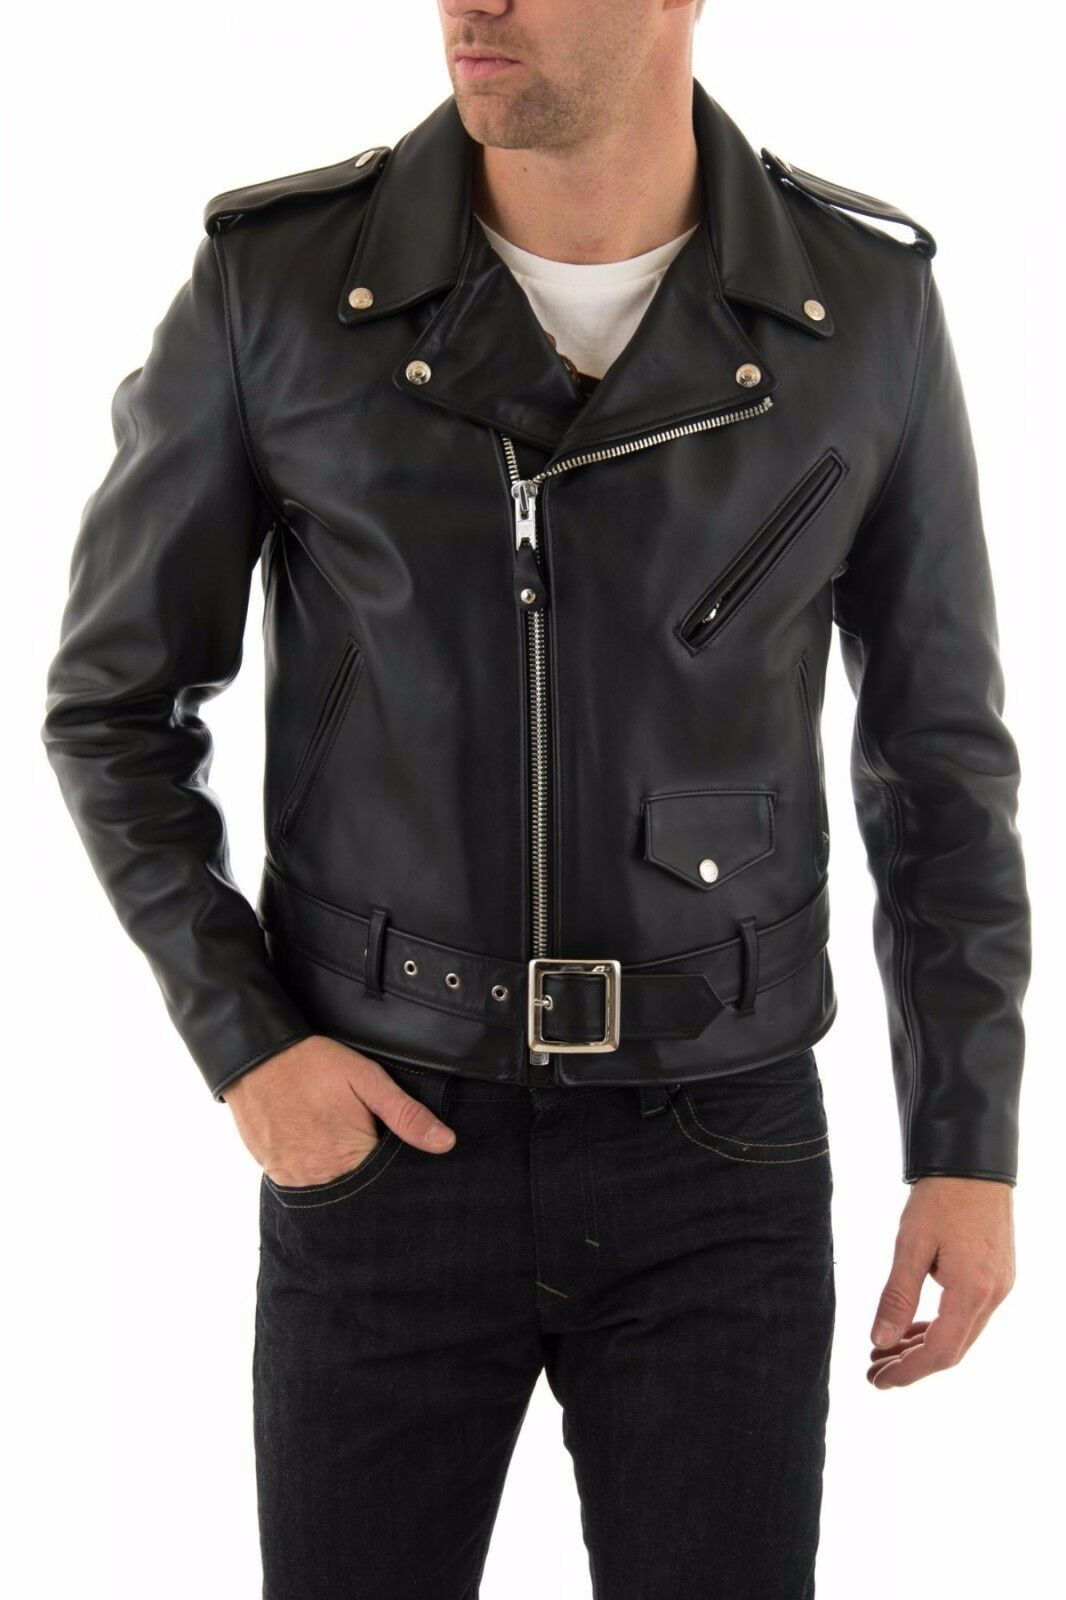 Veste en cuir pour hommes US Veste cuir Herren Lederjacke chaqueta cuero R101a